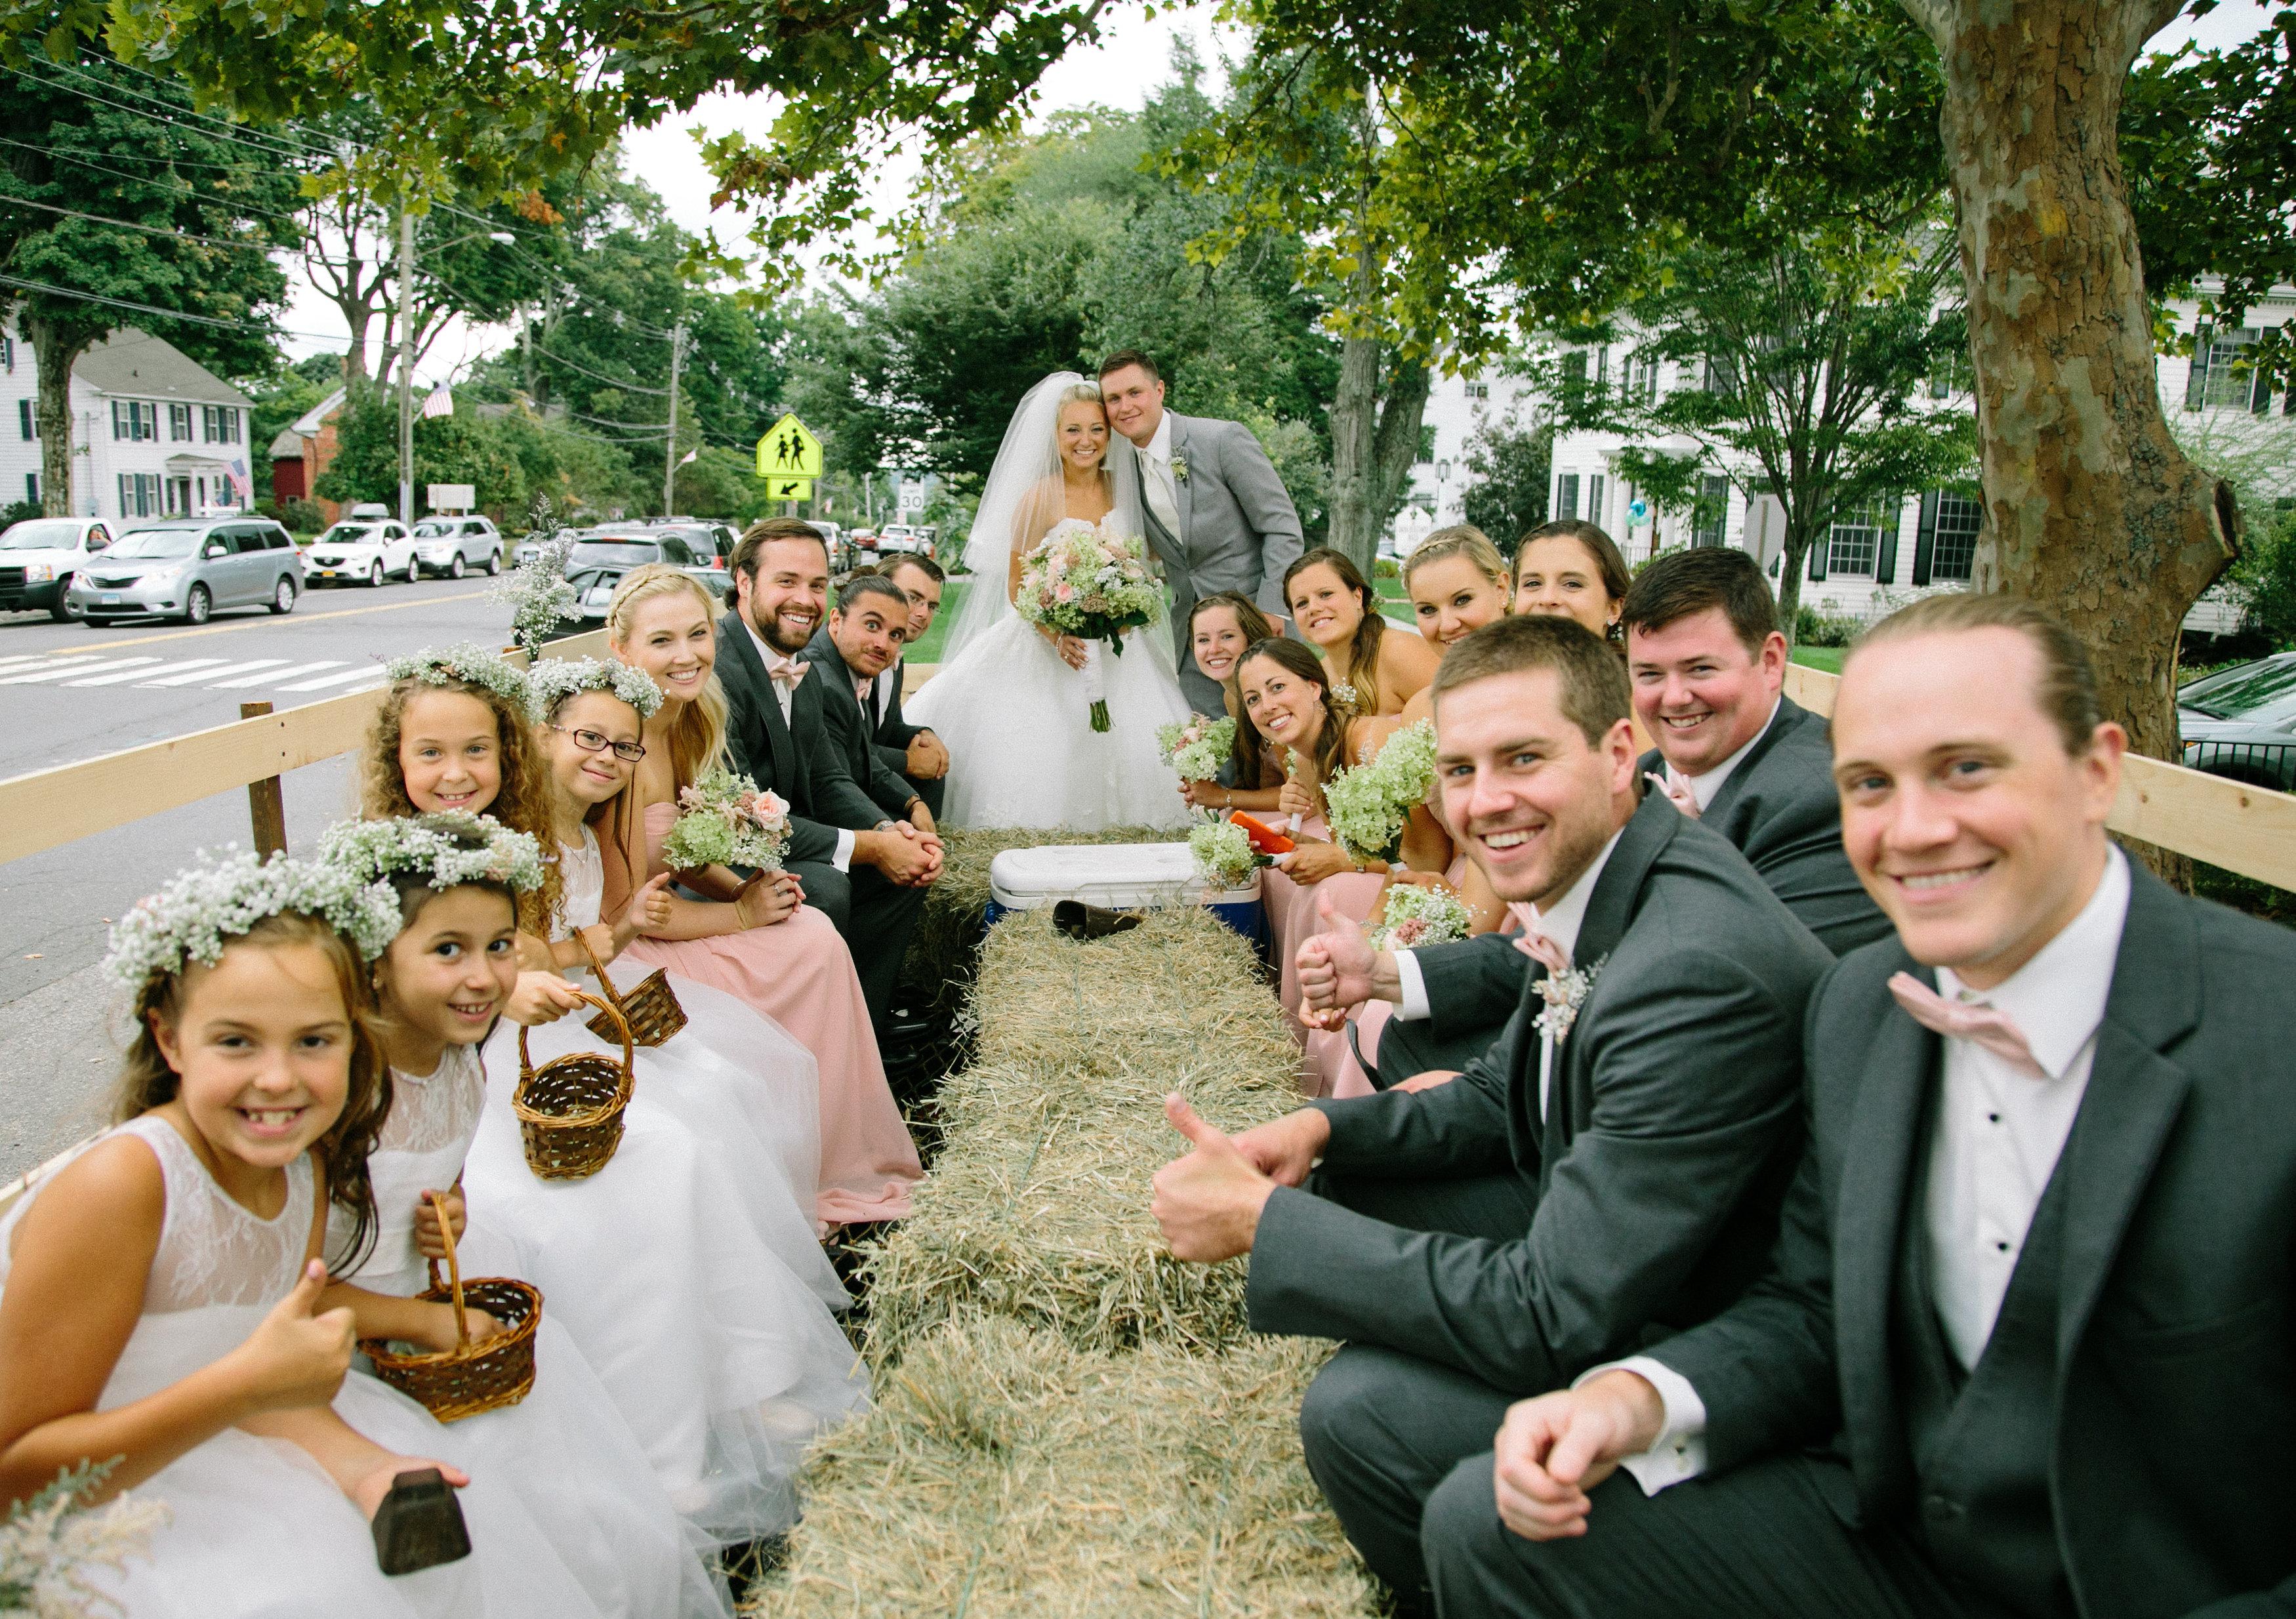 Stephanie&Dan-Wedding-LindsayMaddenPhotographyIV-62